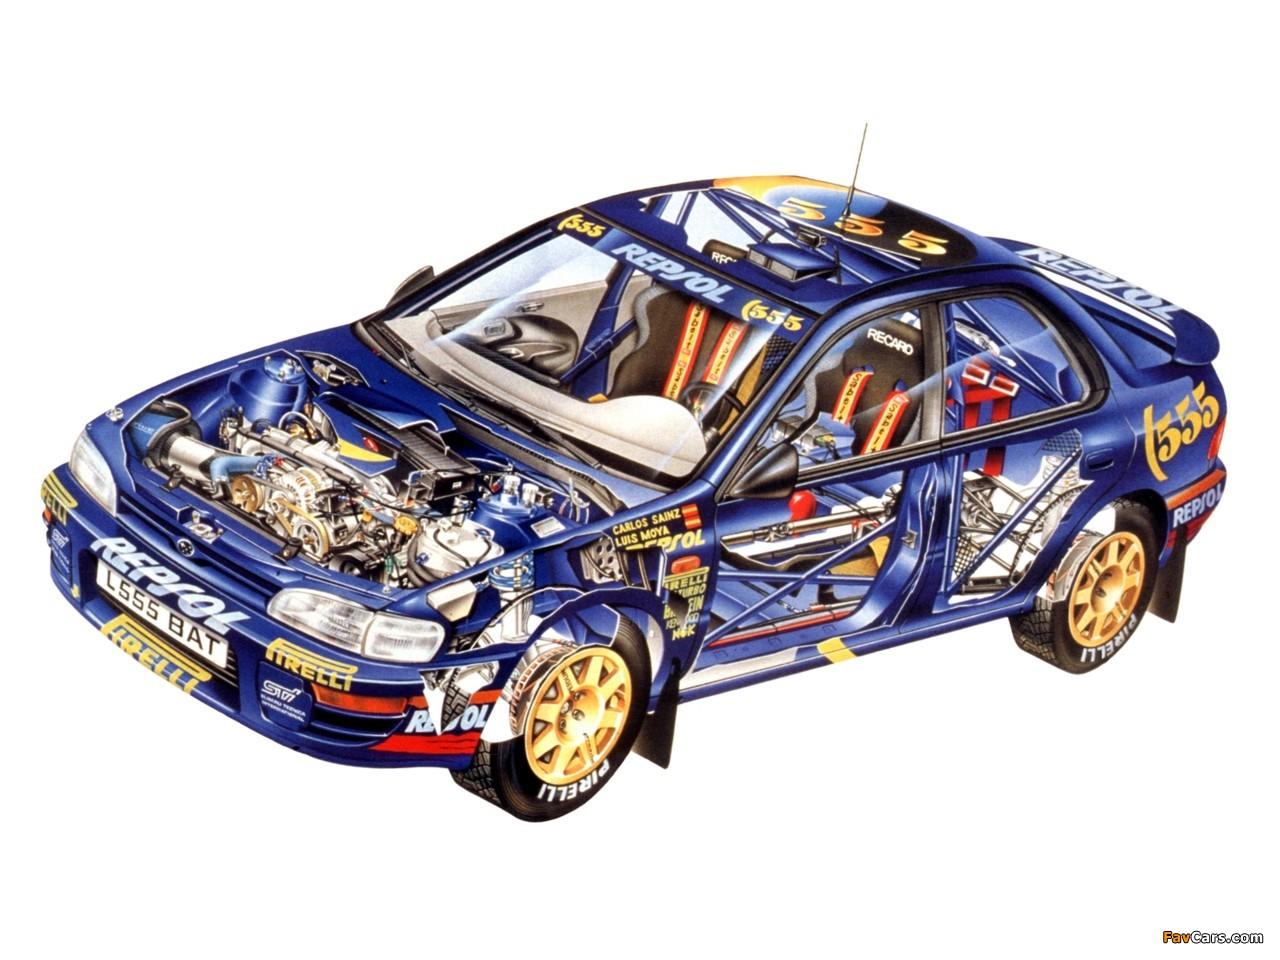 Import Car Wallpapers Subaru Impreza Wrc Gc8 1997 2000 Wallpapers 1280x960